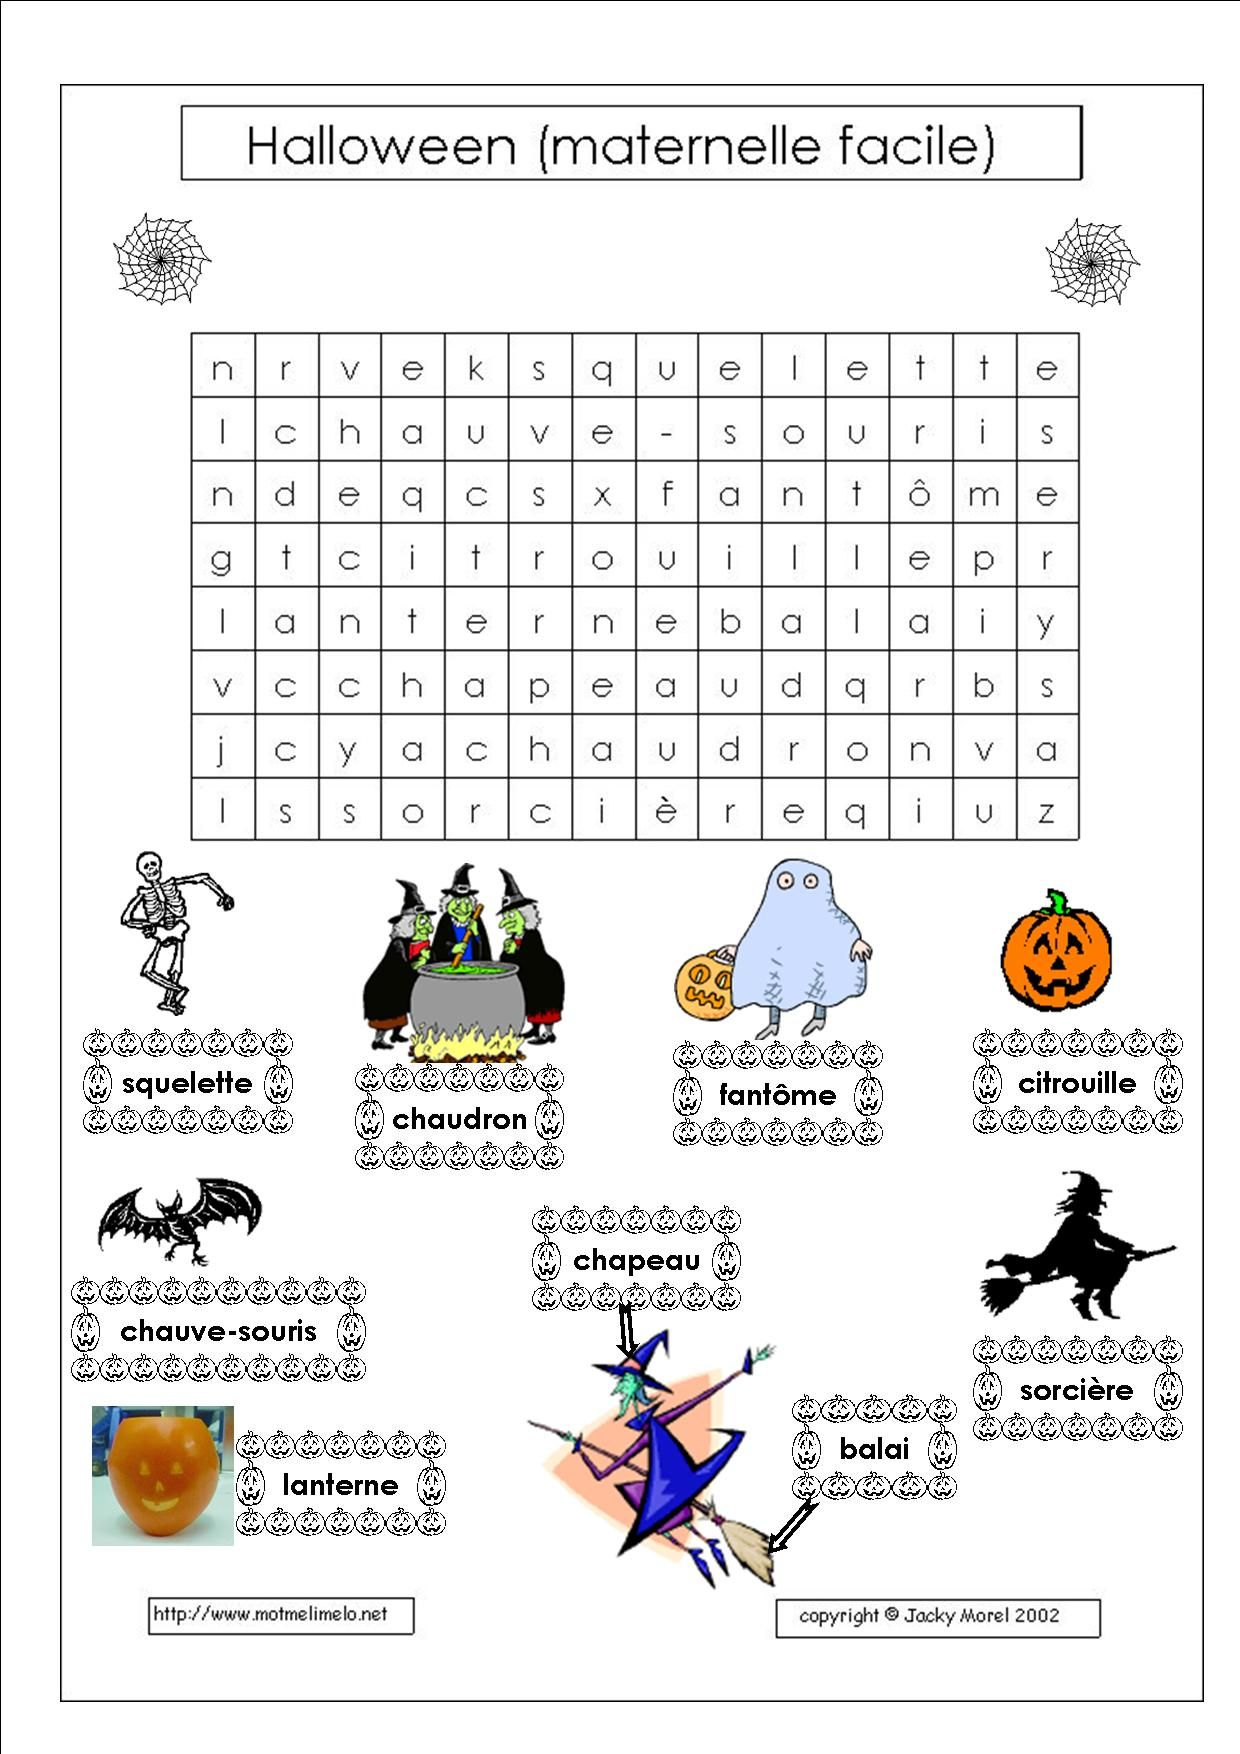 Häufig Halloween maternelle facile | Halloween | Pinterest | Maternelle  CV36